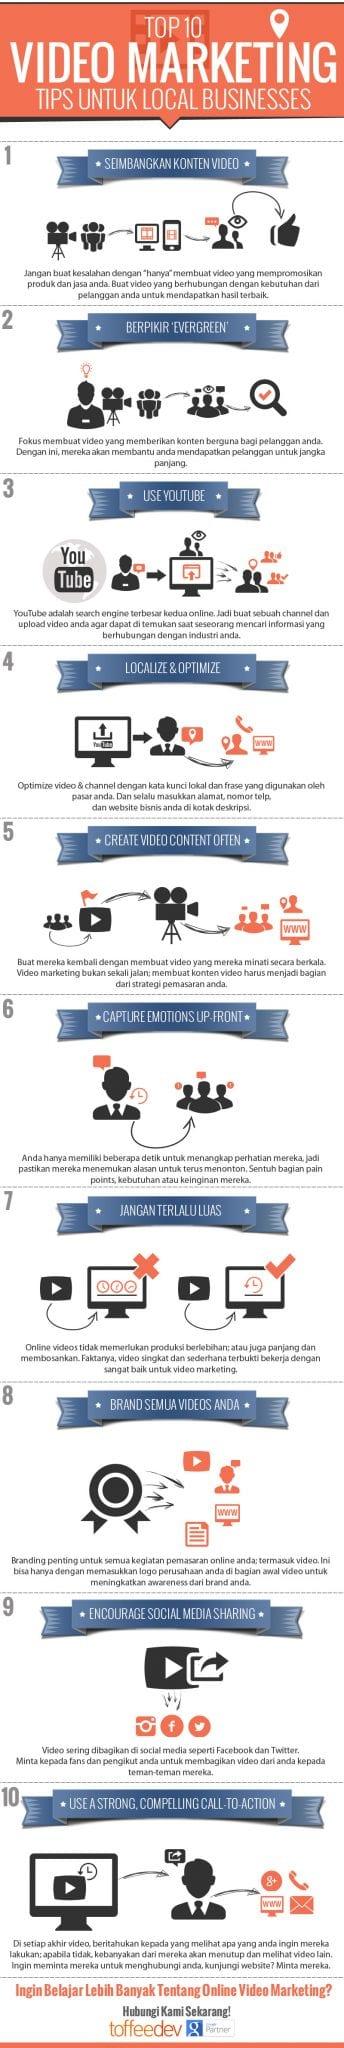 top 10 Video Marketing